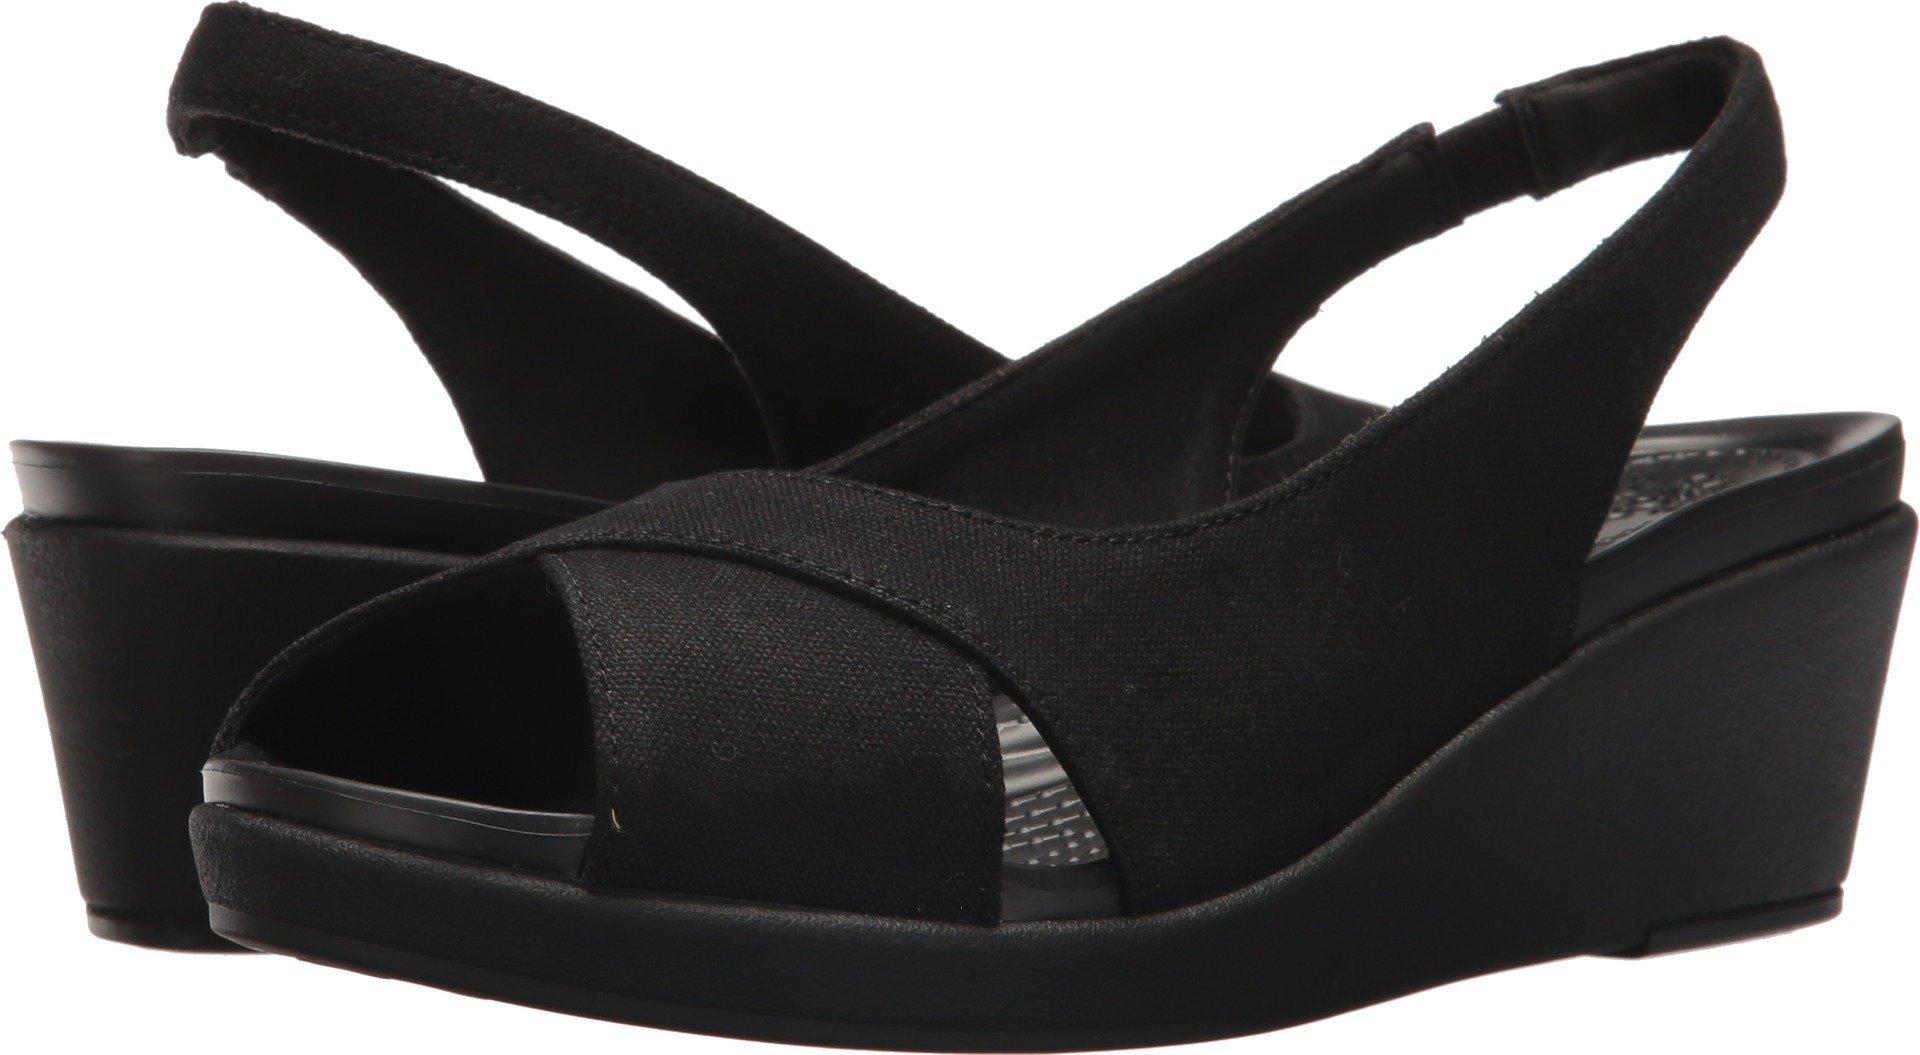 Crocs Women's Leigh Ann Slingback Wedge Sandal, Black/Black, 11 M US